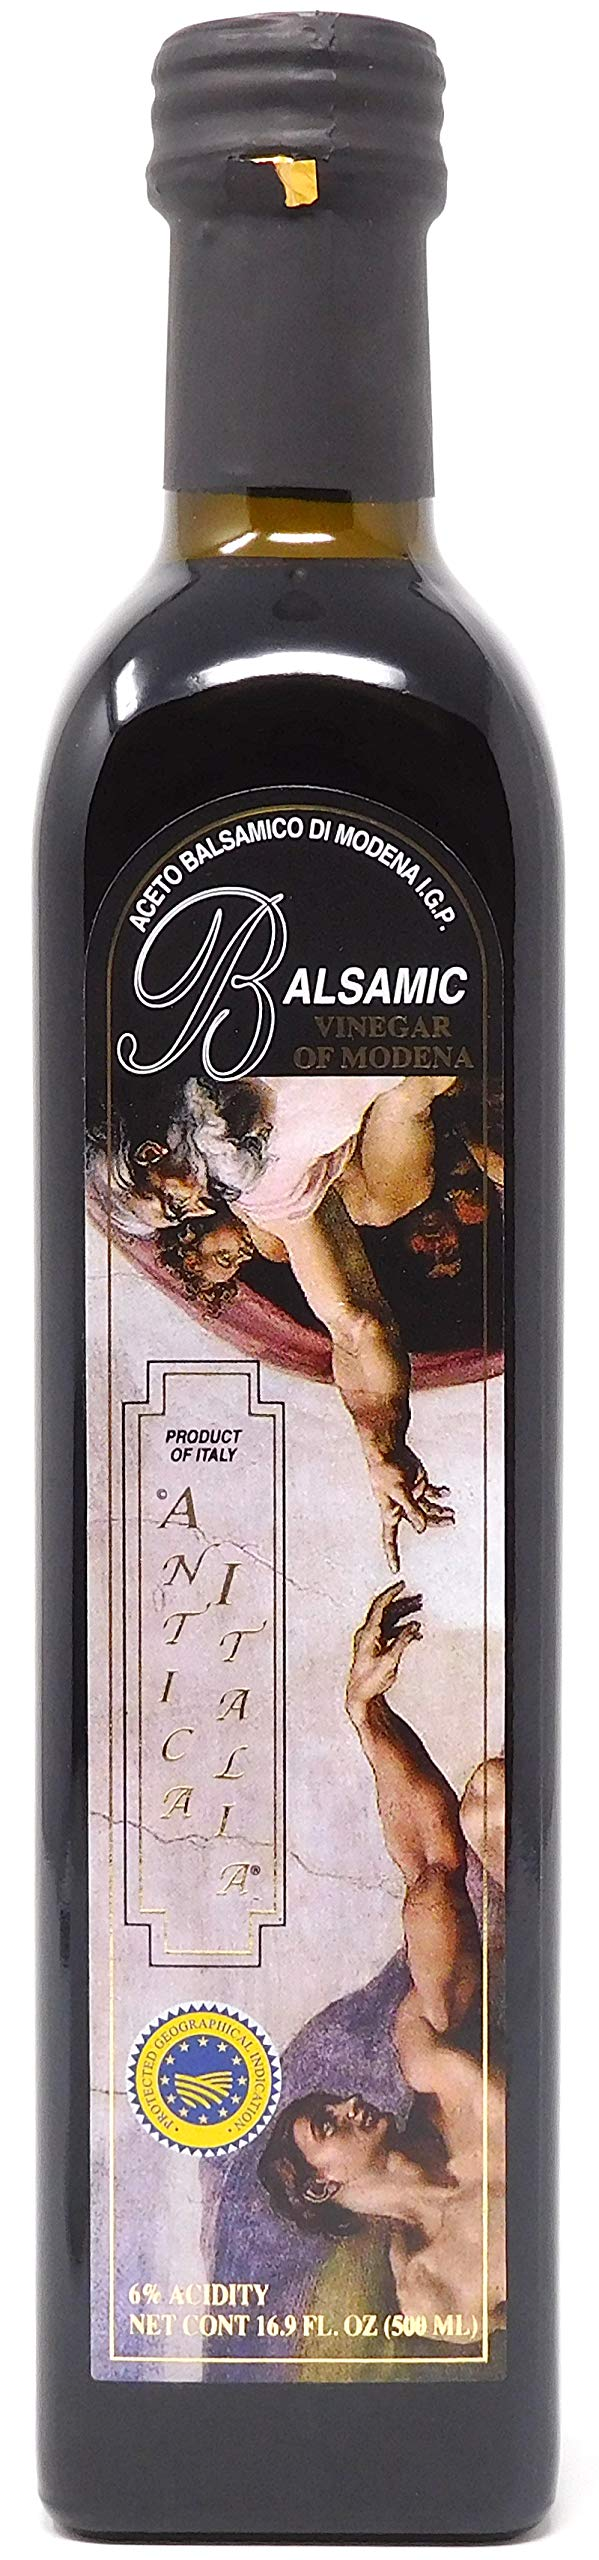 Antica Italia Aged Italian Balsamic Vinegar of Modena IGP 16.9 Ounce (500ml) by Antica Italia